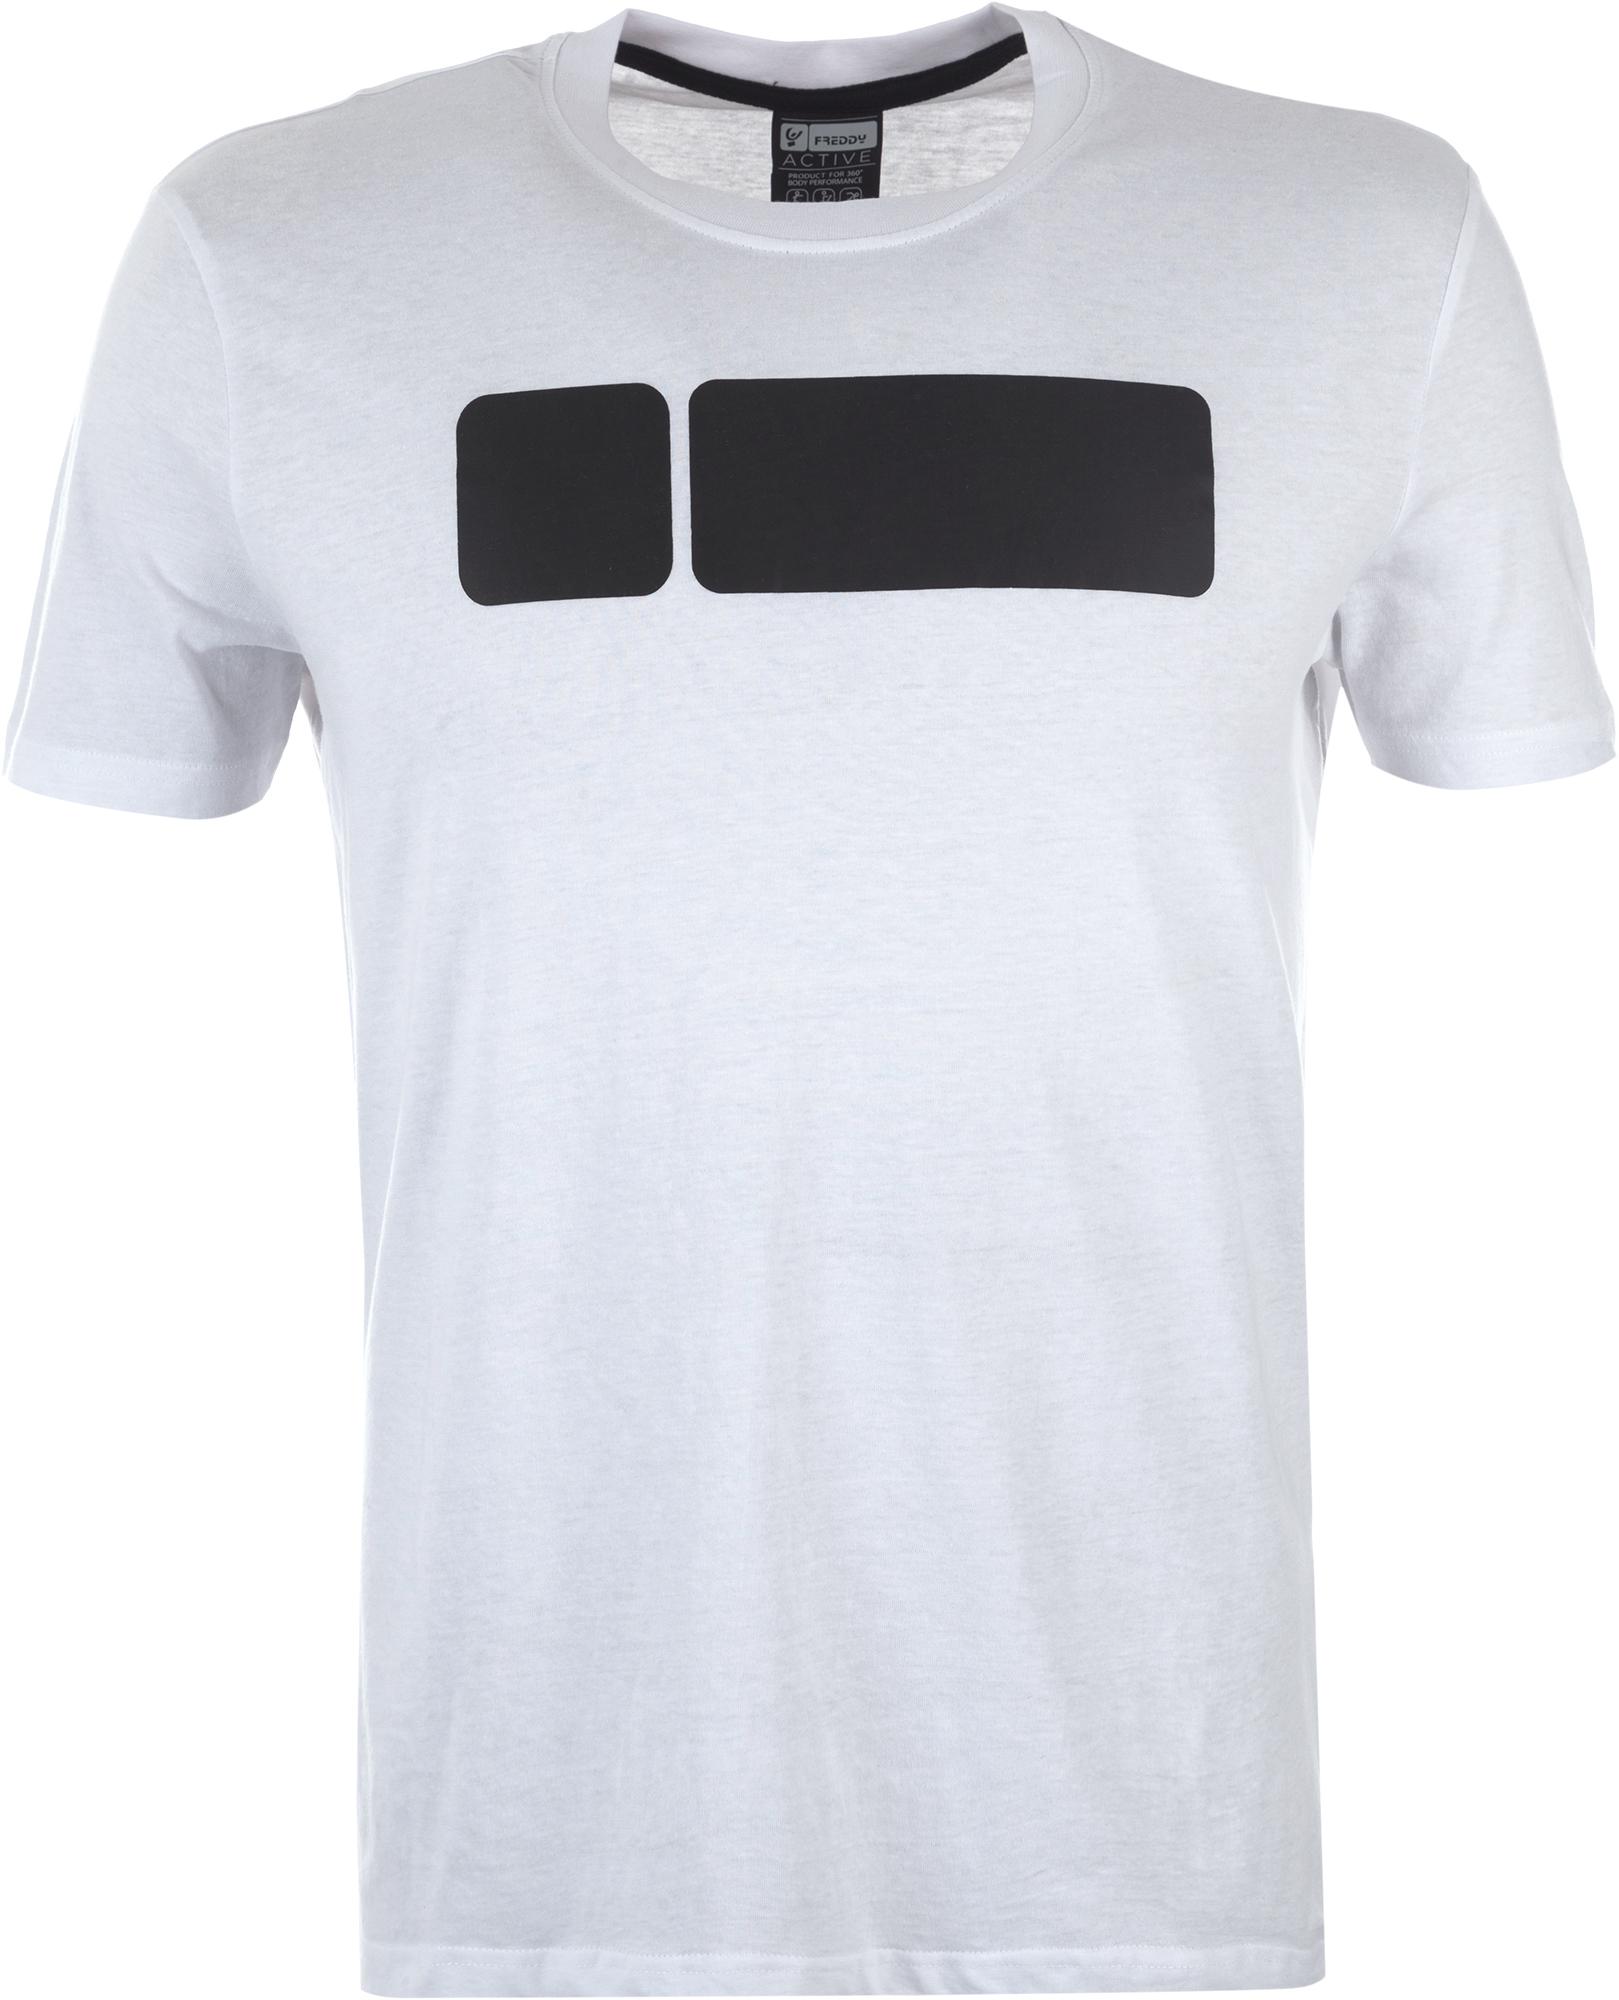 все цены на Freddy Футболка мужская Freddy Basic Cotton, размер 52-54 в интернете